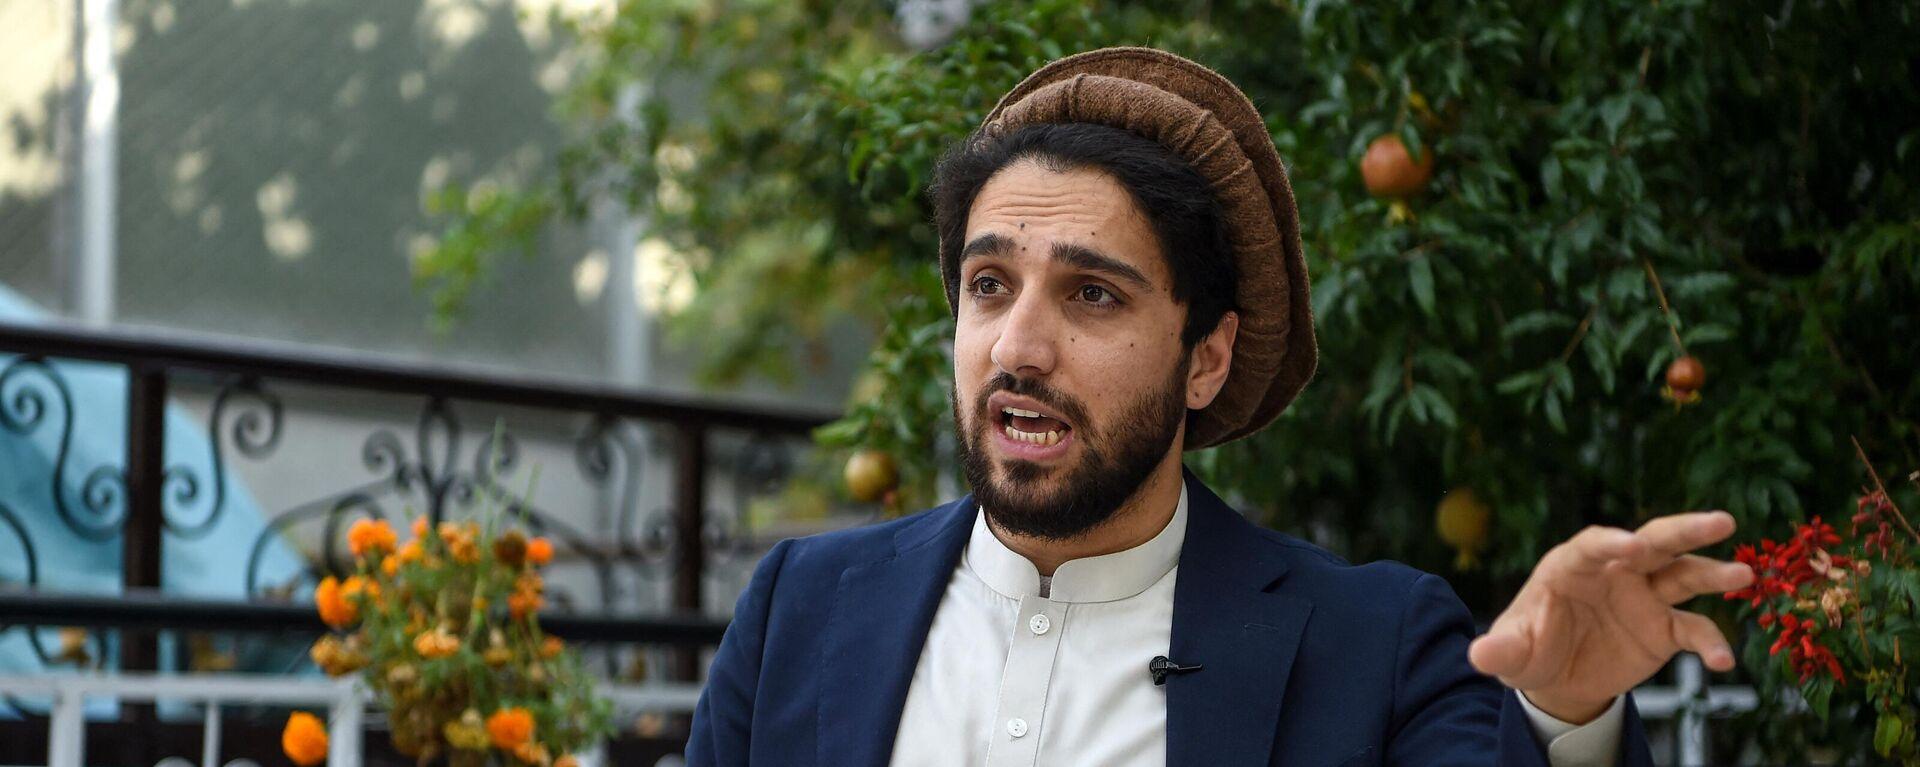 Ахмад Масуд, сын покойного афганского политика и военачальника Ахмад Шаха Масуда - Sputnik Таджикистан, 1920, 04.09.2021